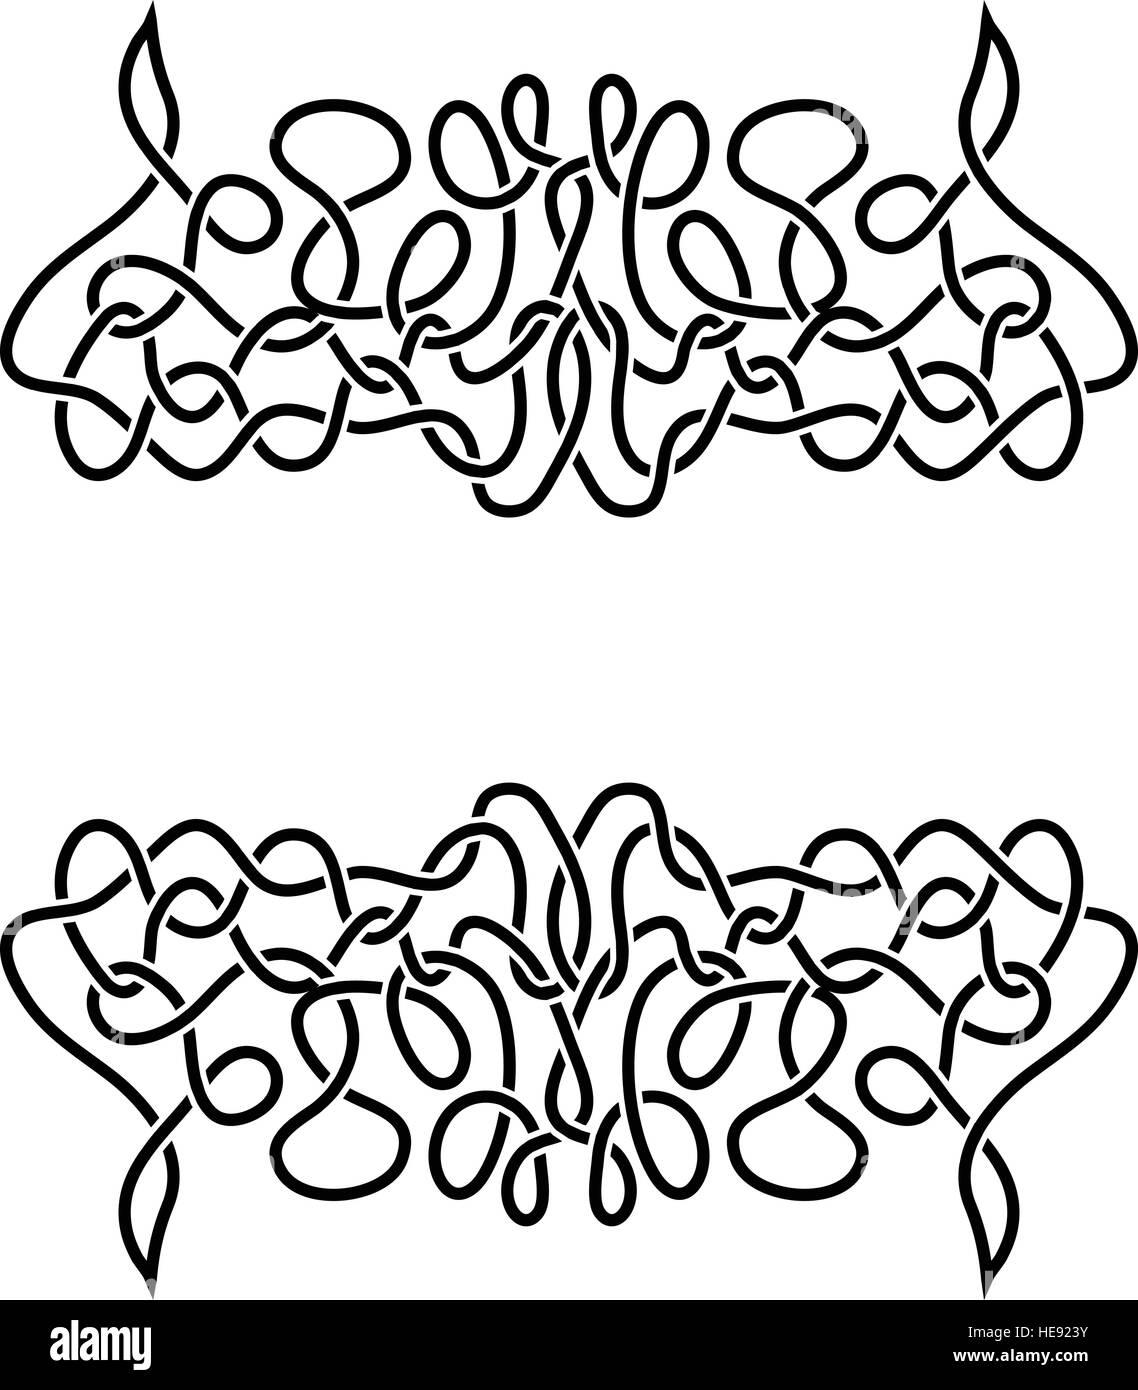 Celtic ornament - Stock Image